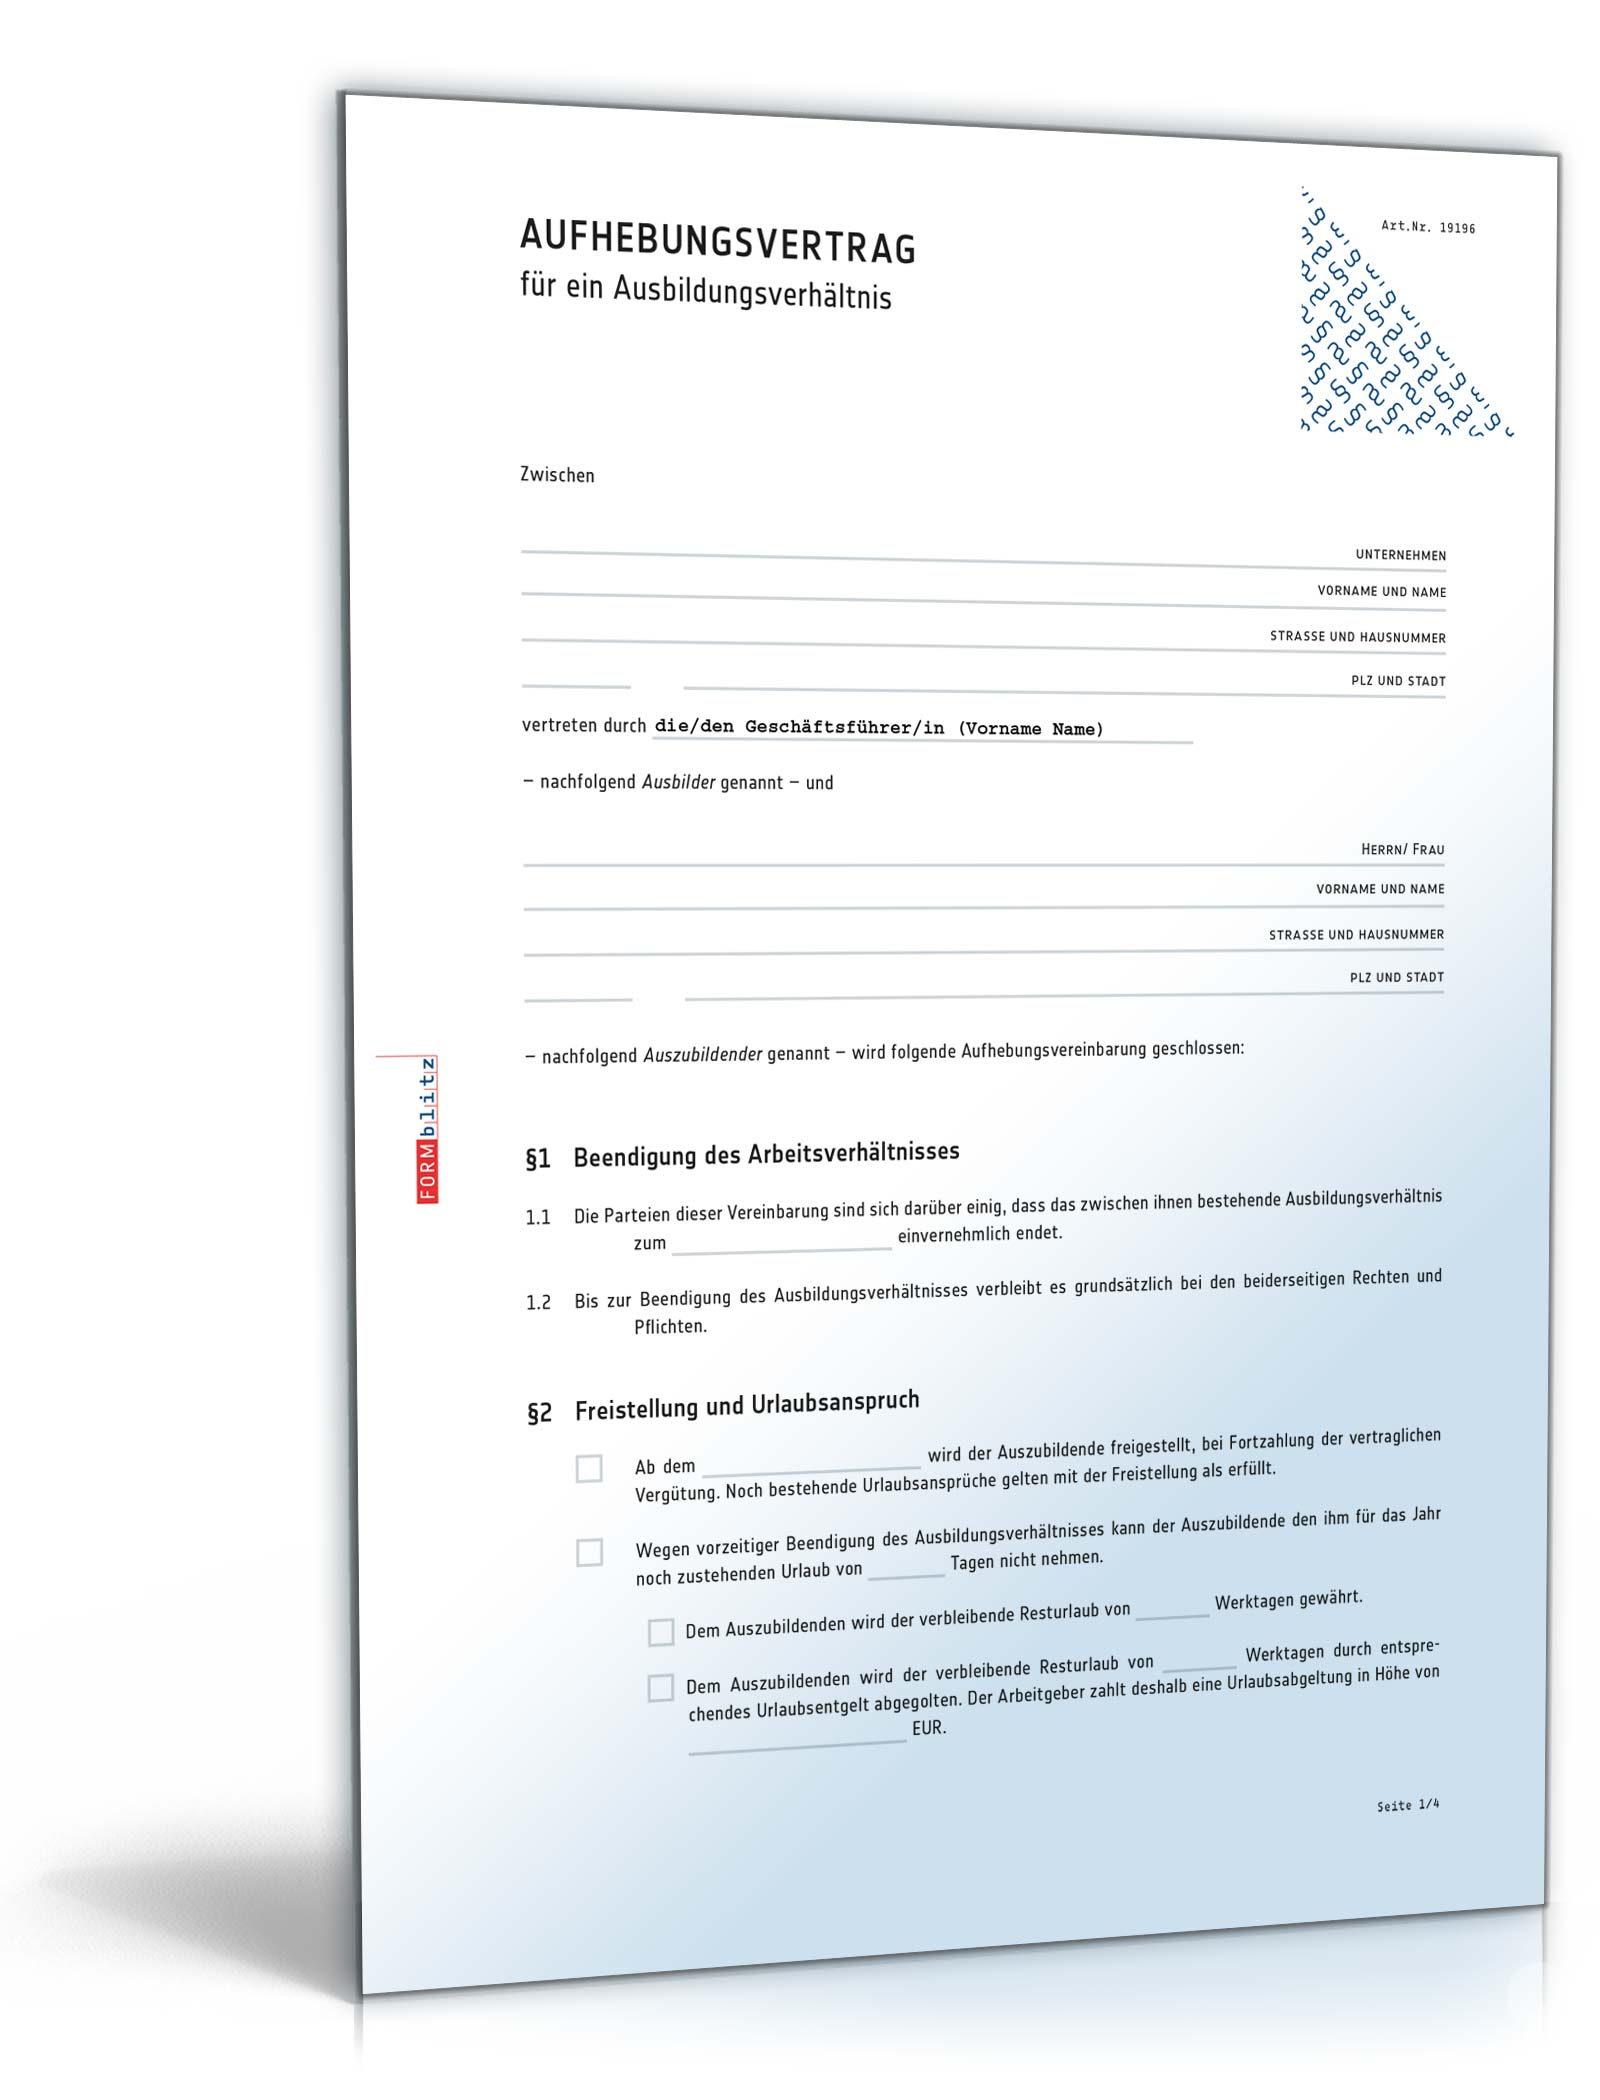 Aufhebungsvertrag Ausbildungsverhältnis Muster Zum Download